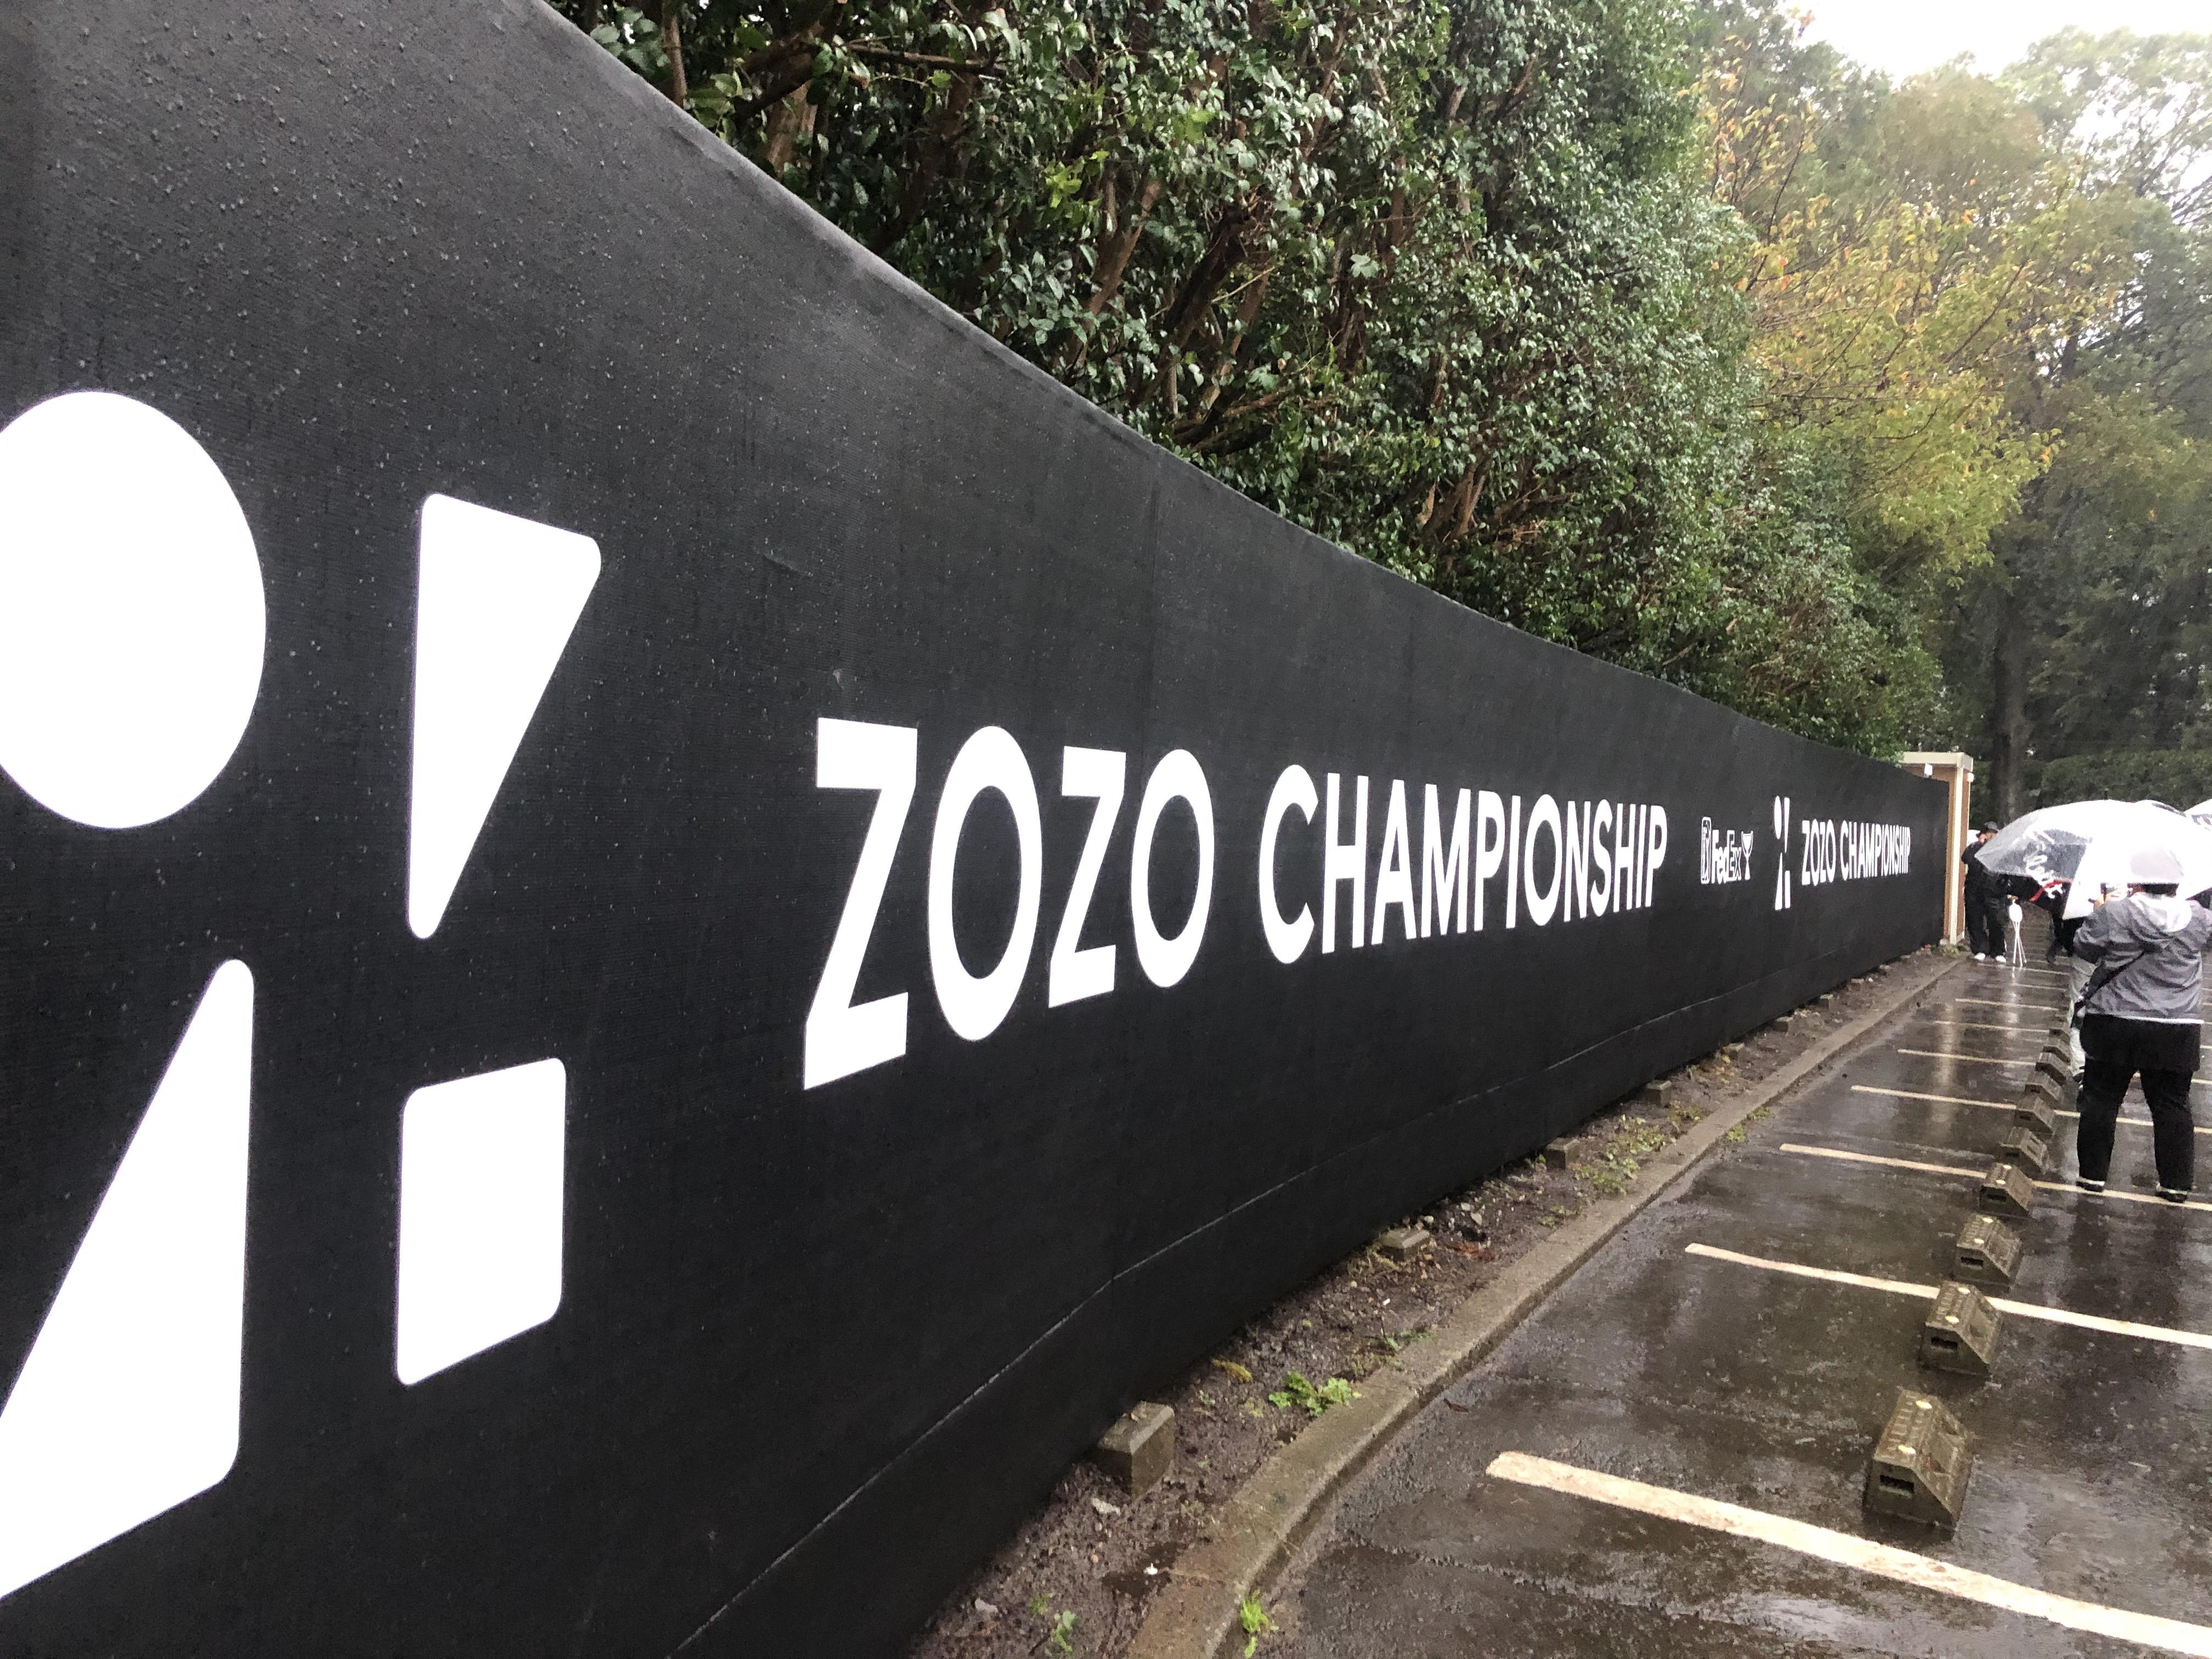 ZOZOチャンピオンシップのトーナメント観戦記を書くはずだったが・・・